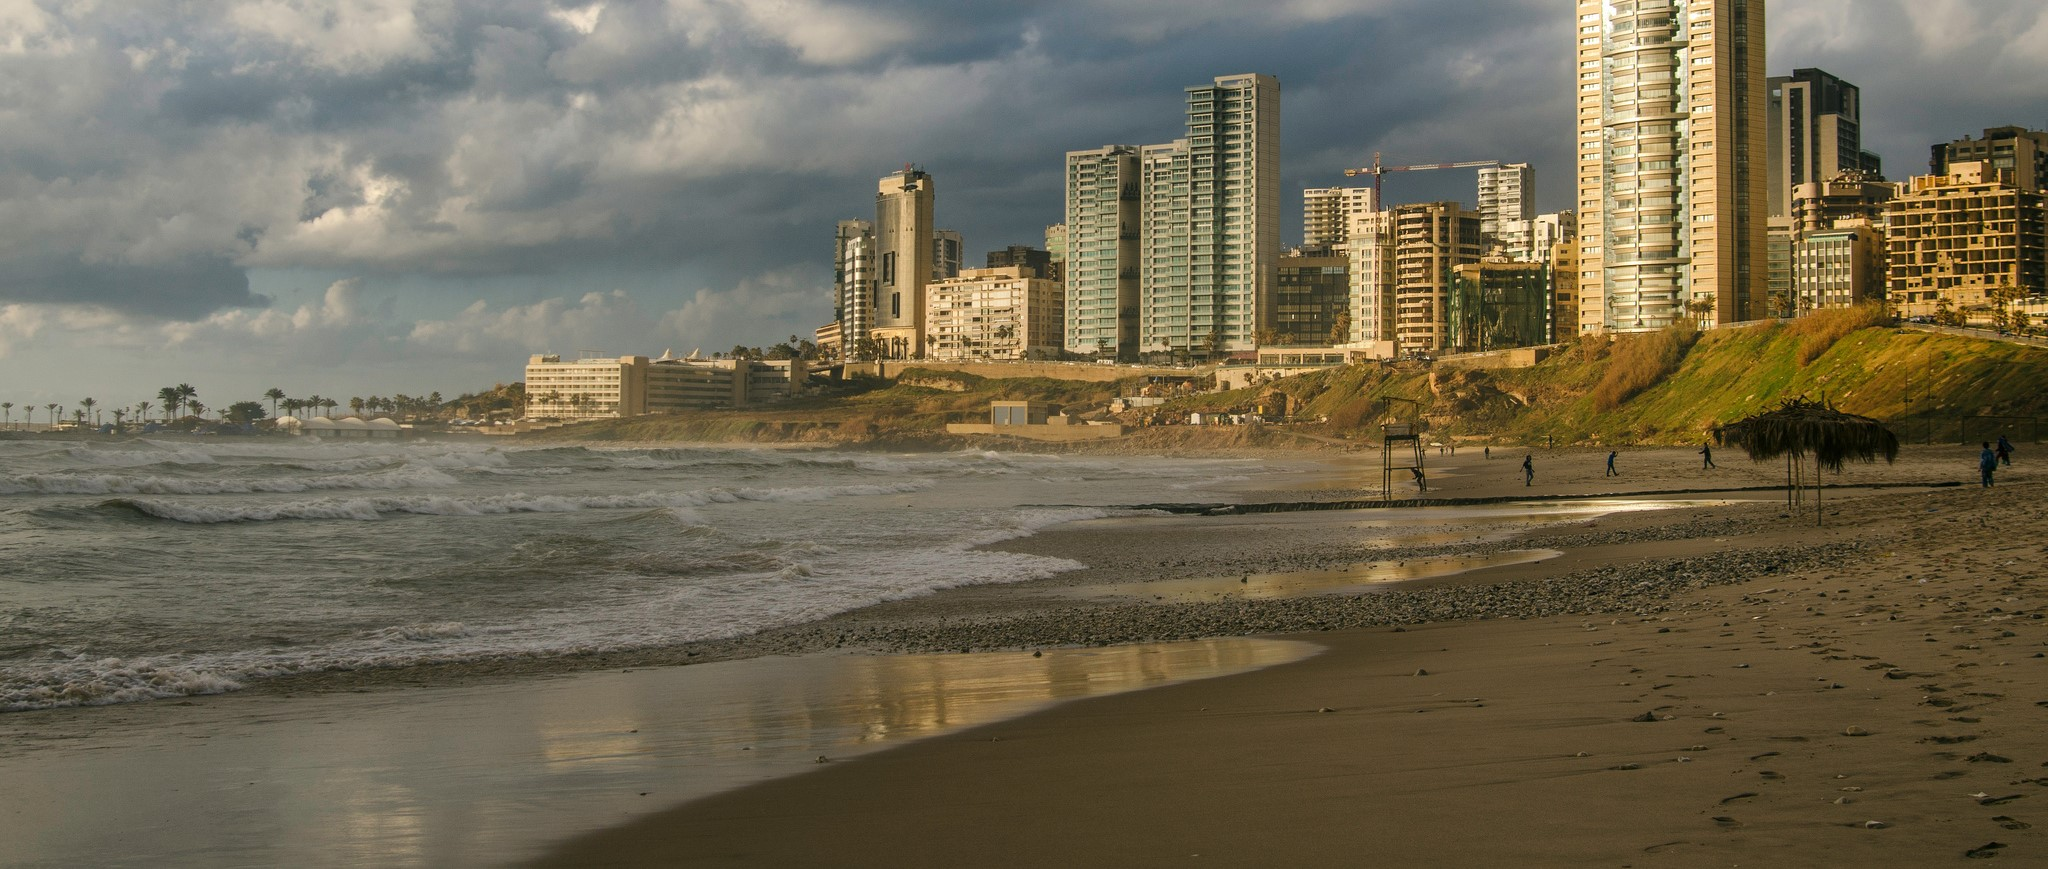 A beach in Beirut, Lebanon, 2016 (Photo: Flickr/Jonhy Blaze)